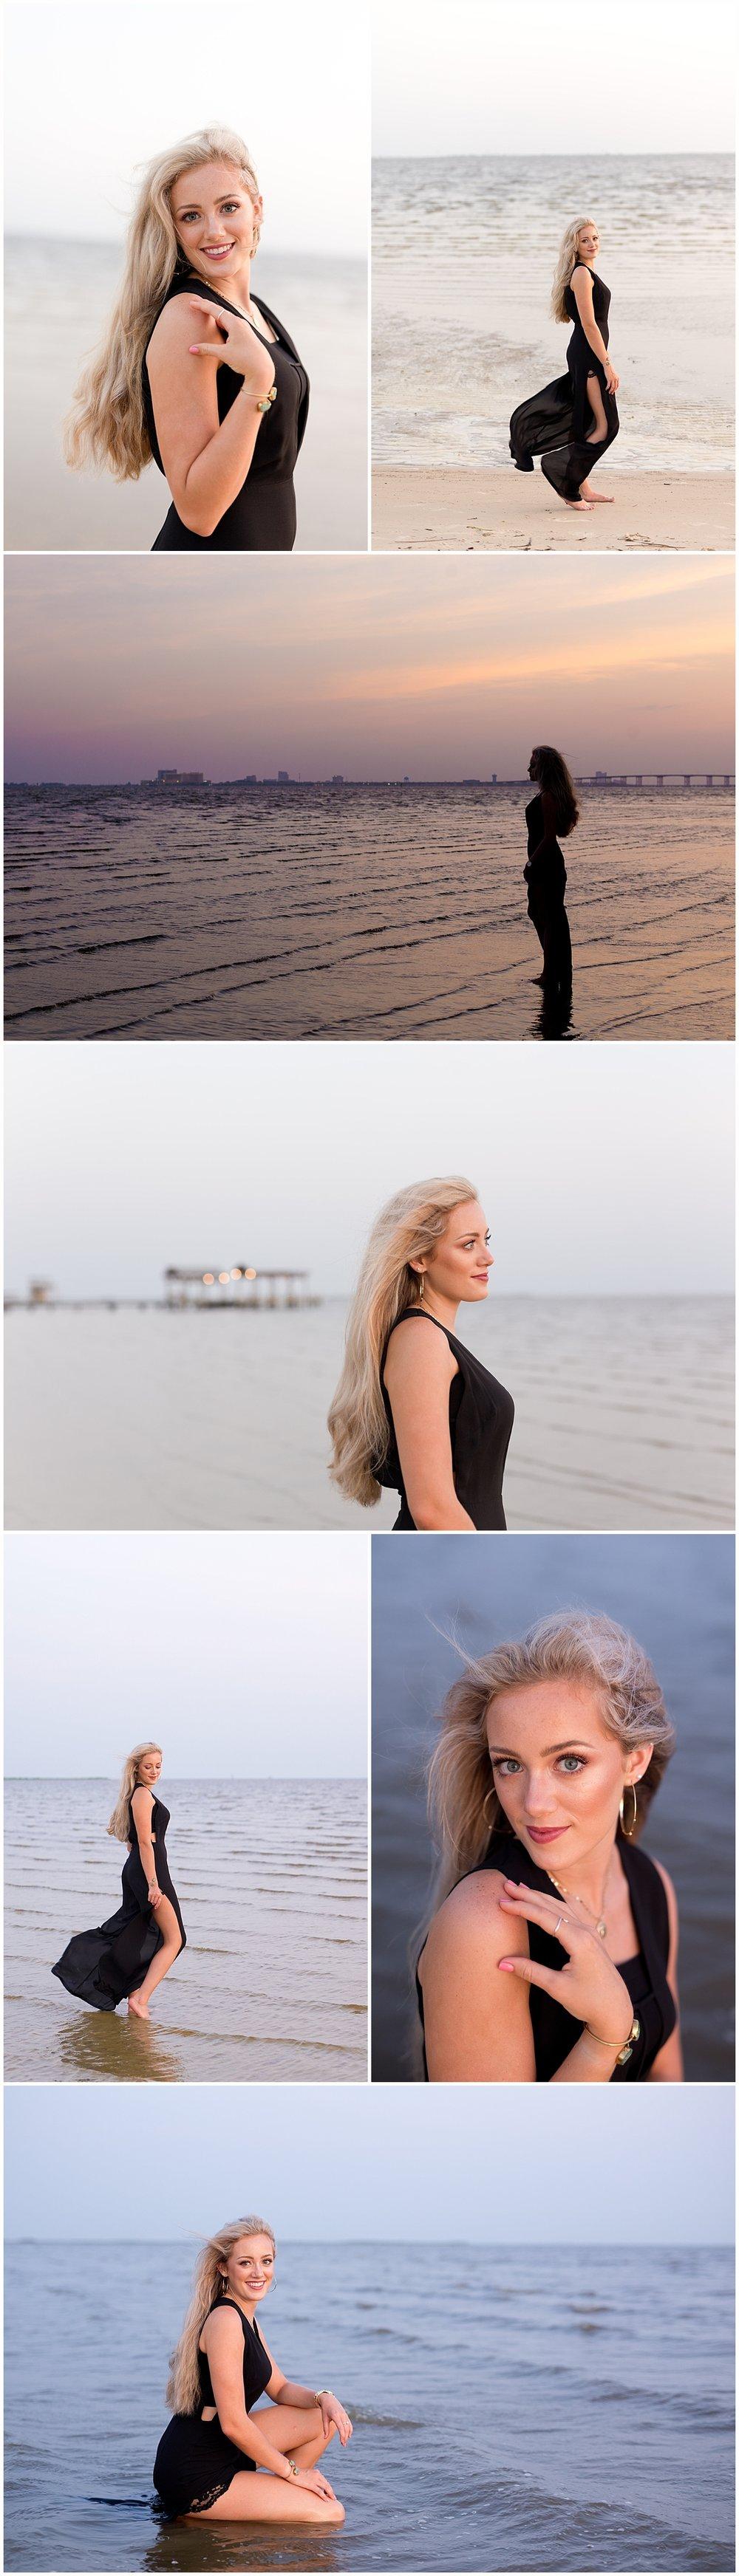 Ocean Springs senior portraits - East Beach senior pictures